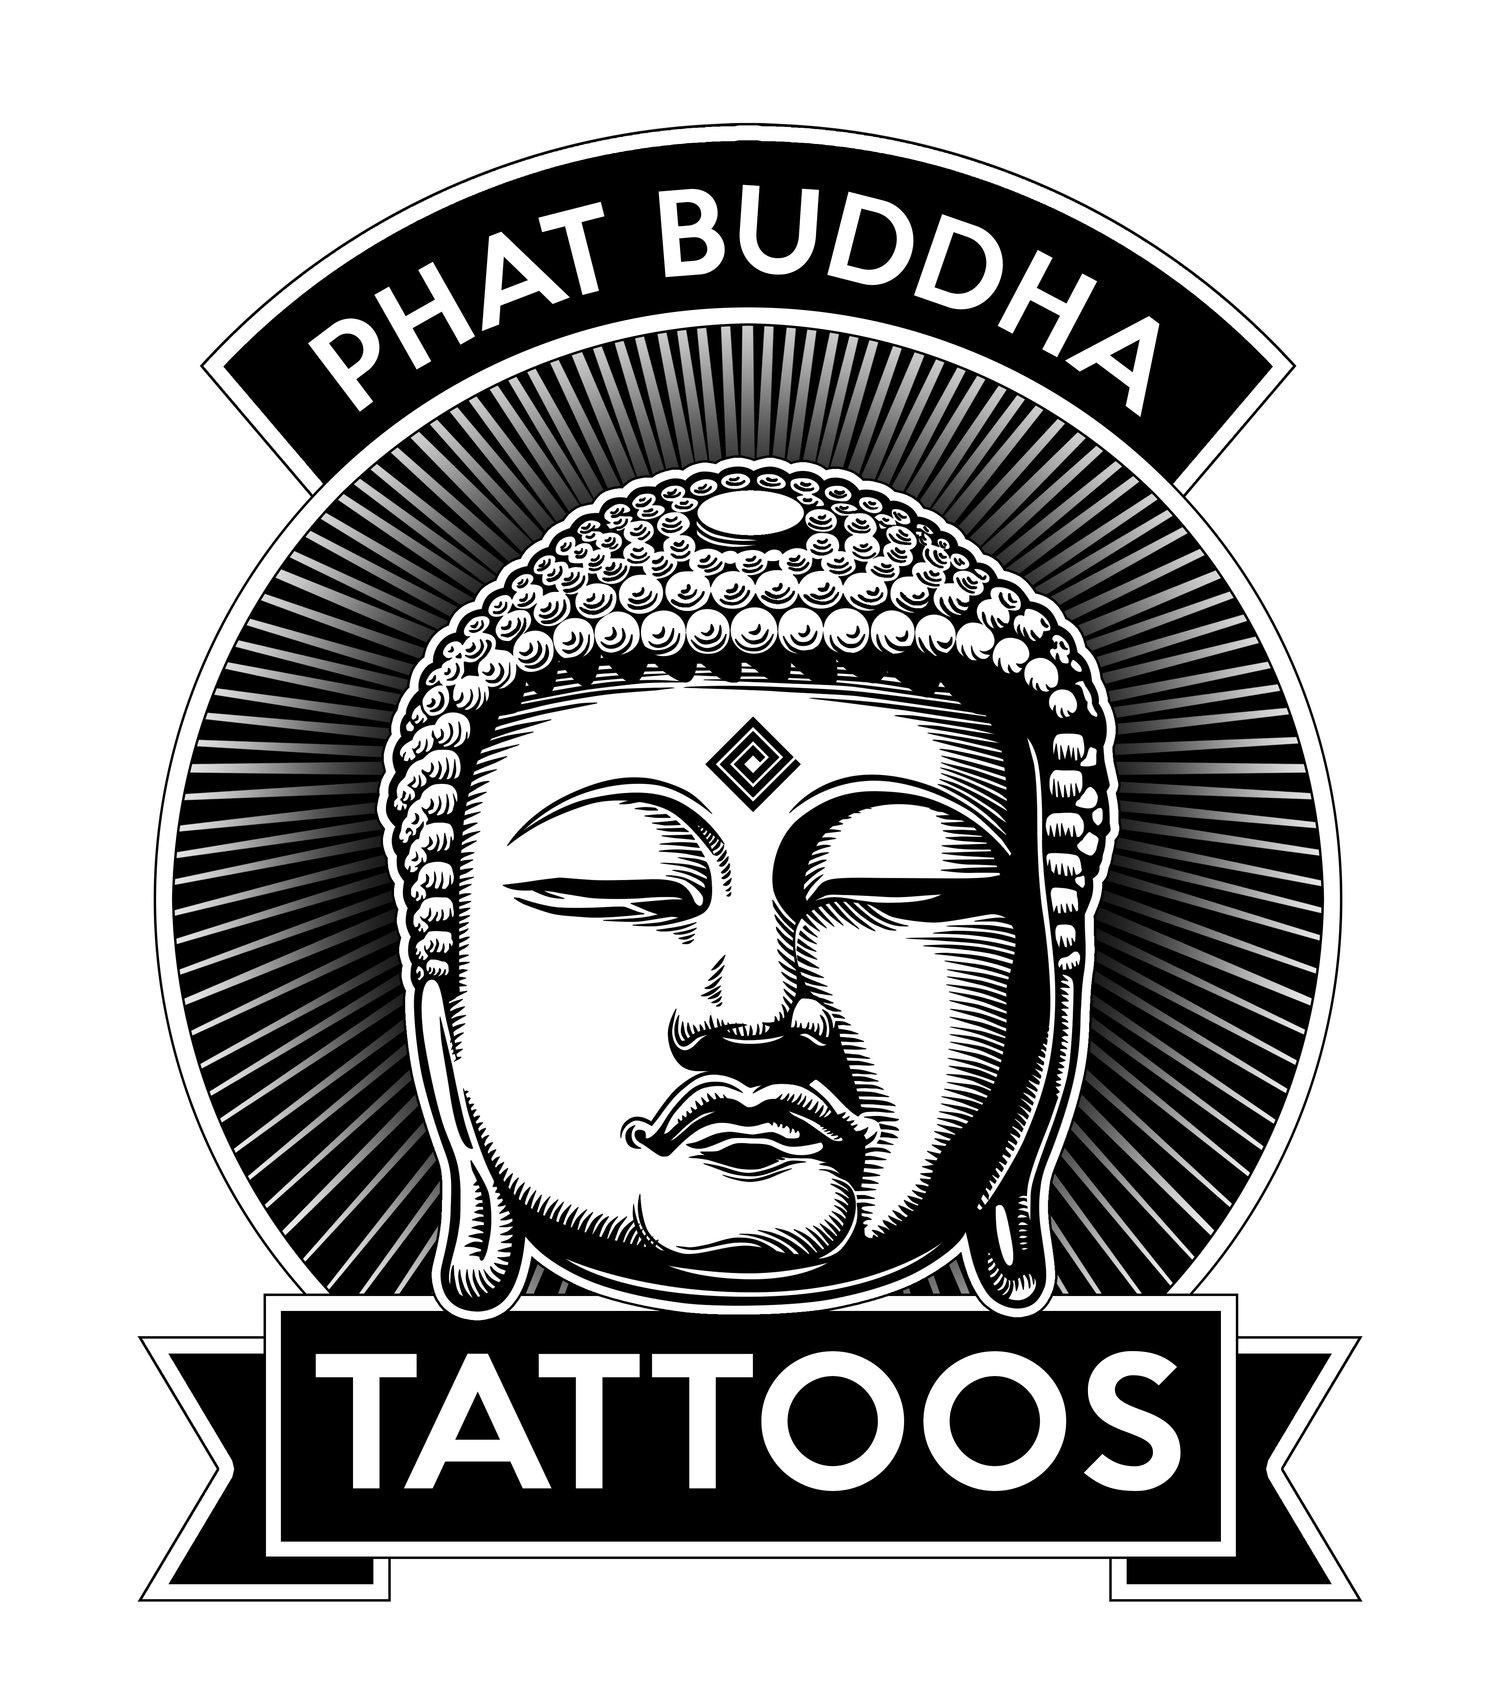 Phat Buddha Tattoos